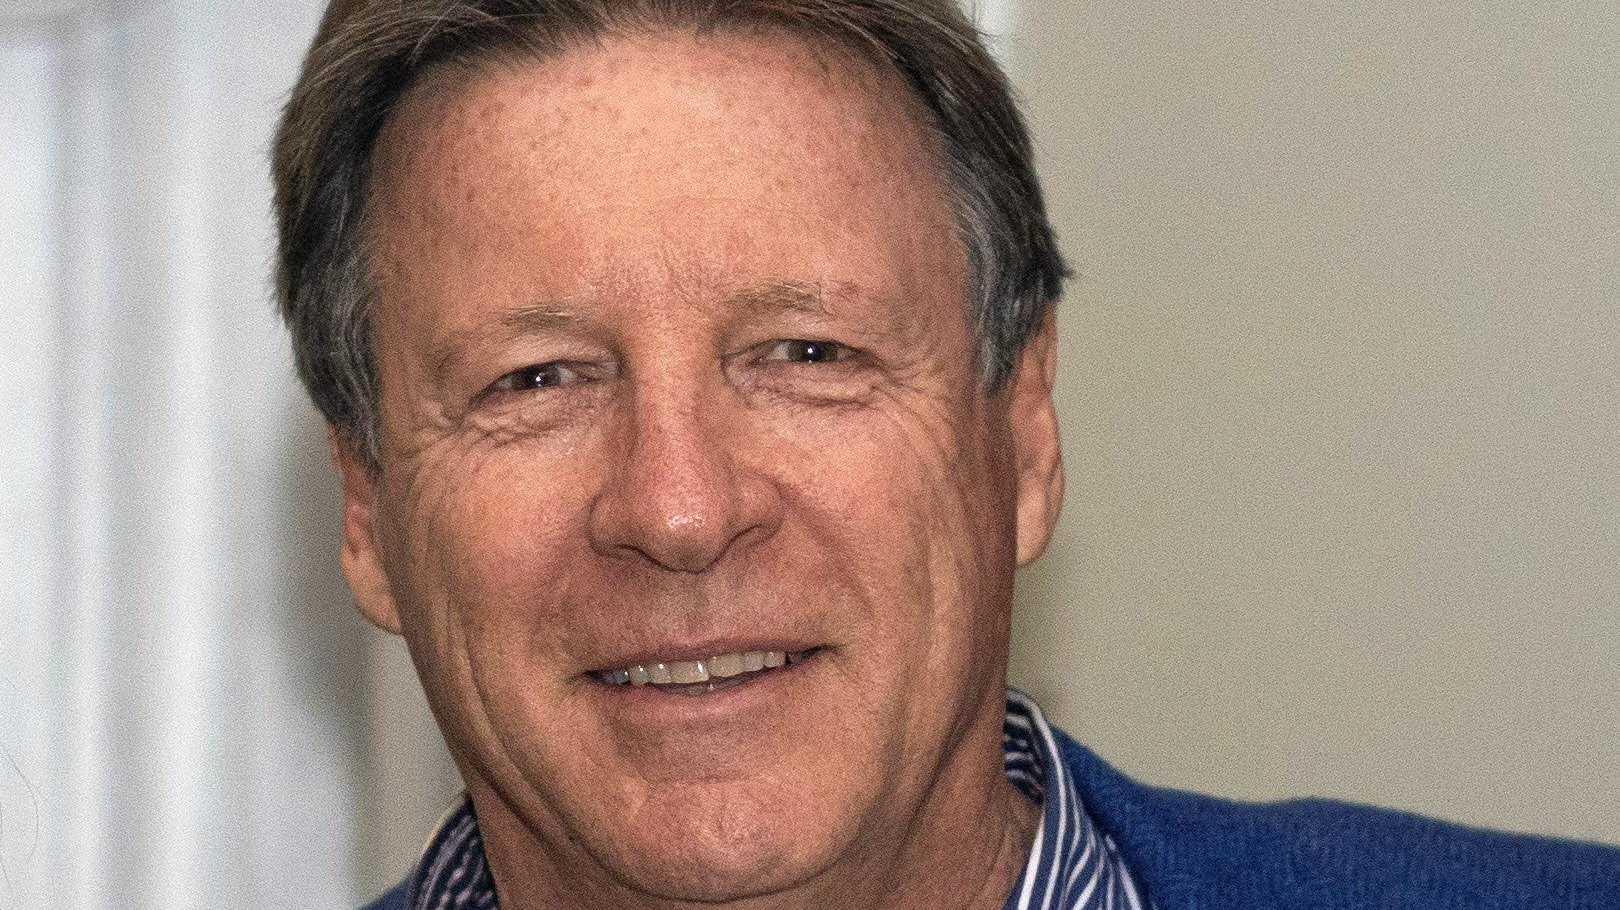 Noosa Mayor Tony Wellington has delivered the 2019/2020 Budget